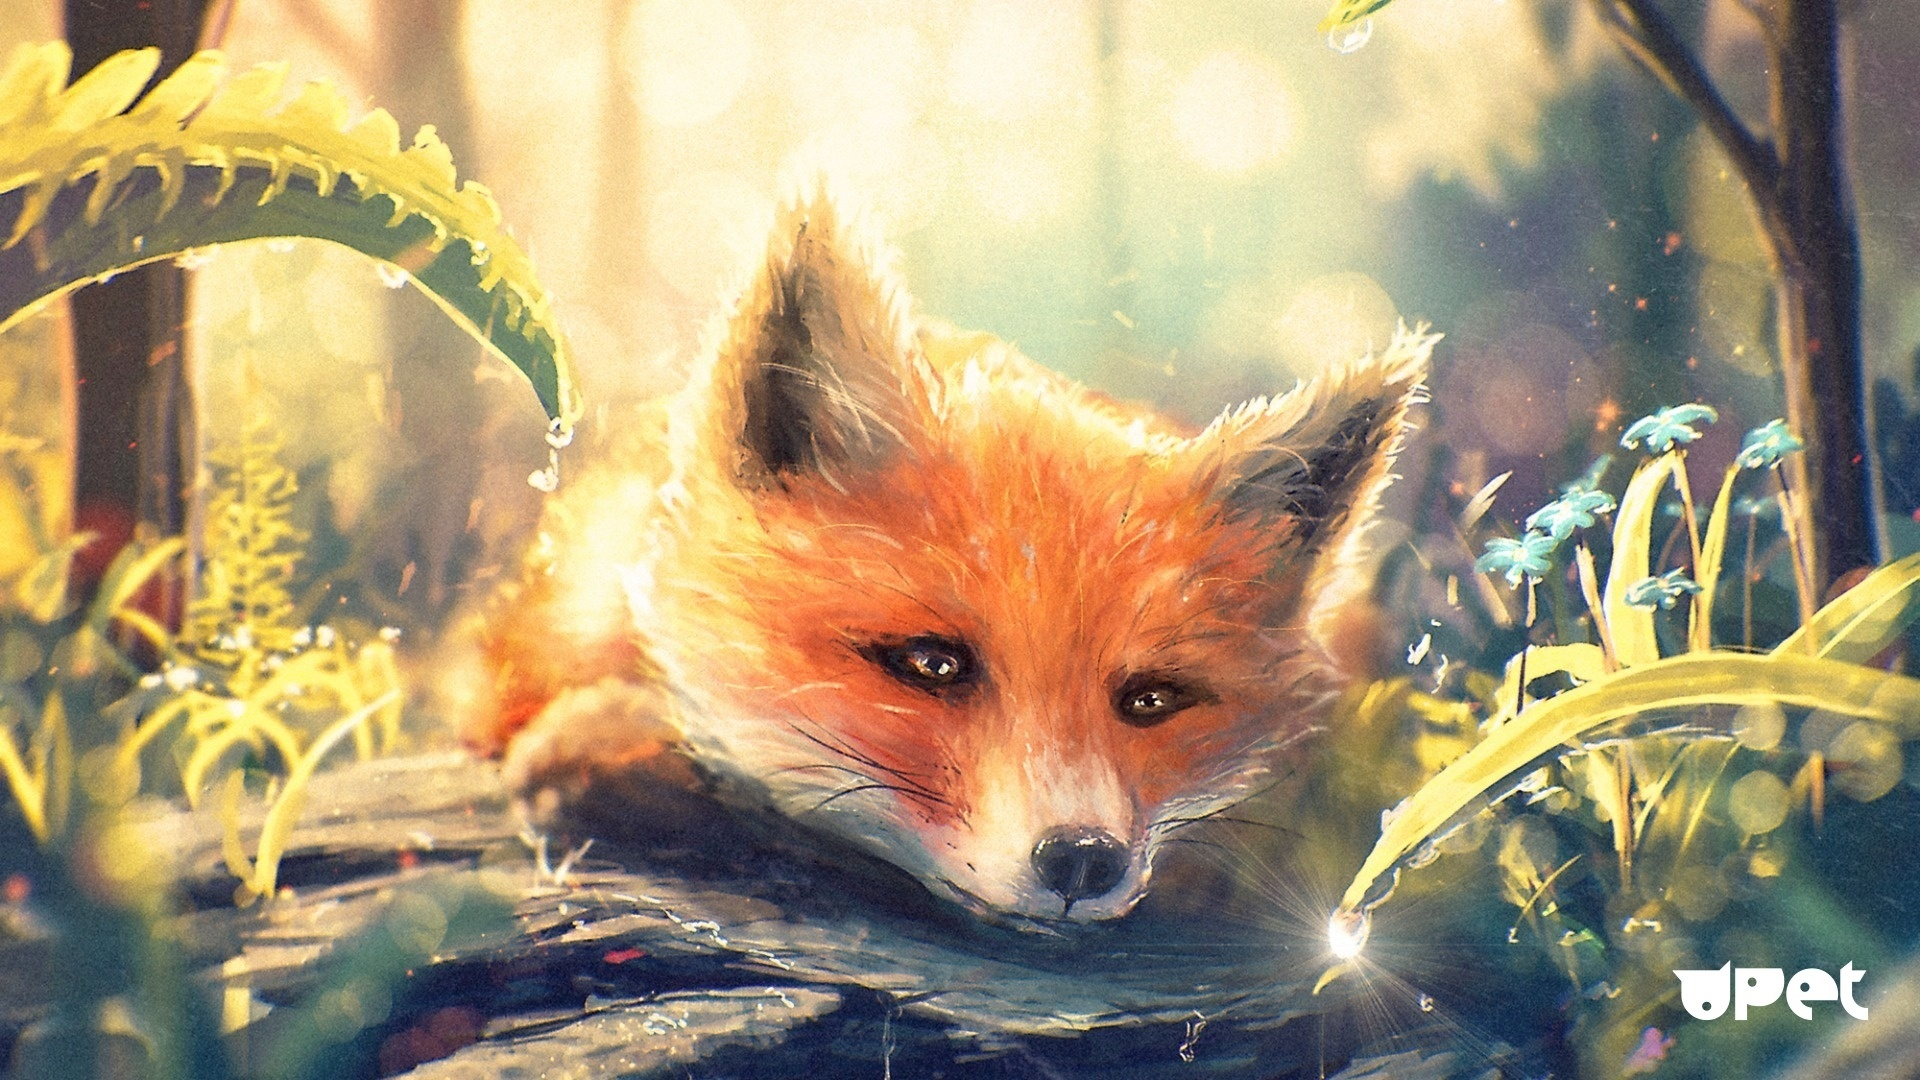 Fox Art wallpaper photo hd